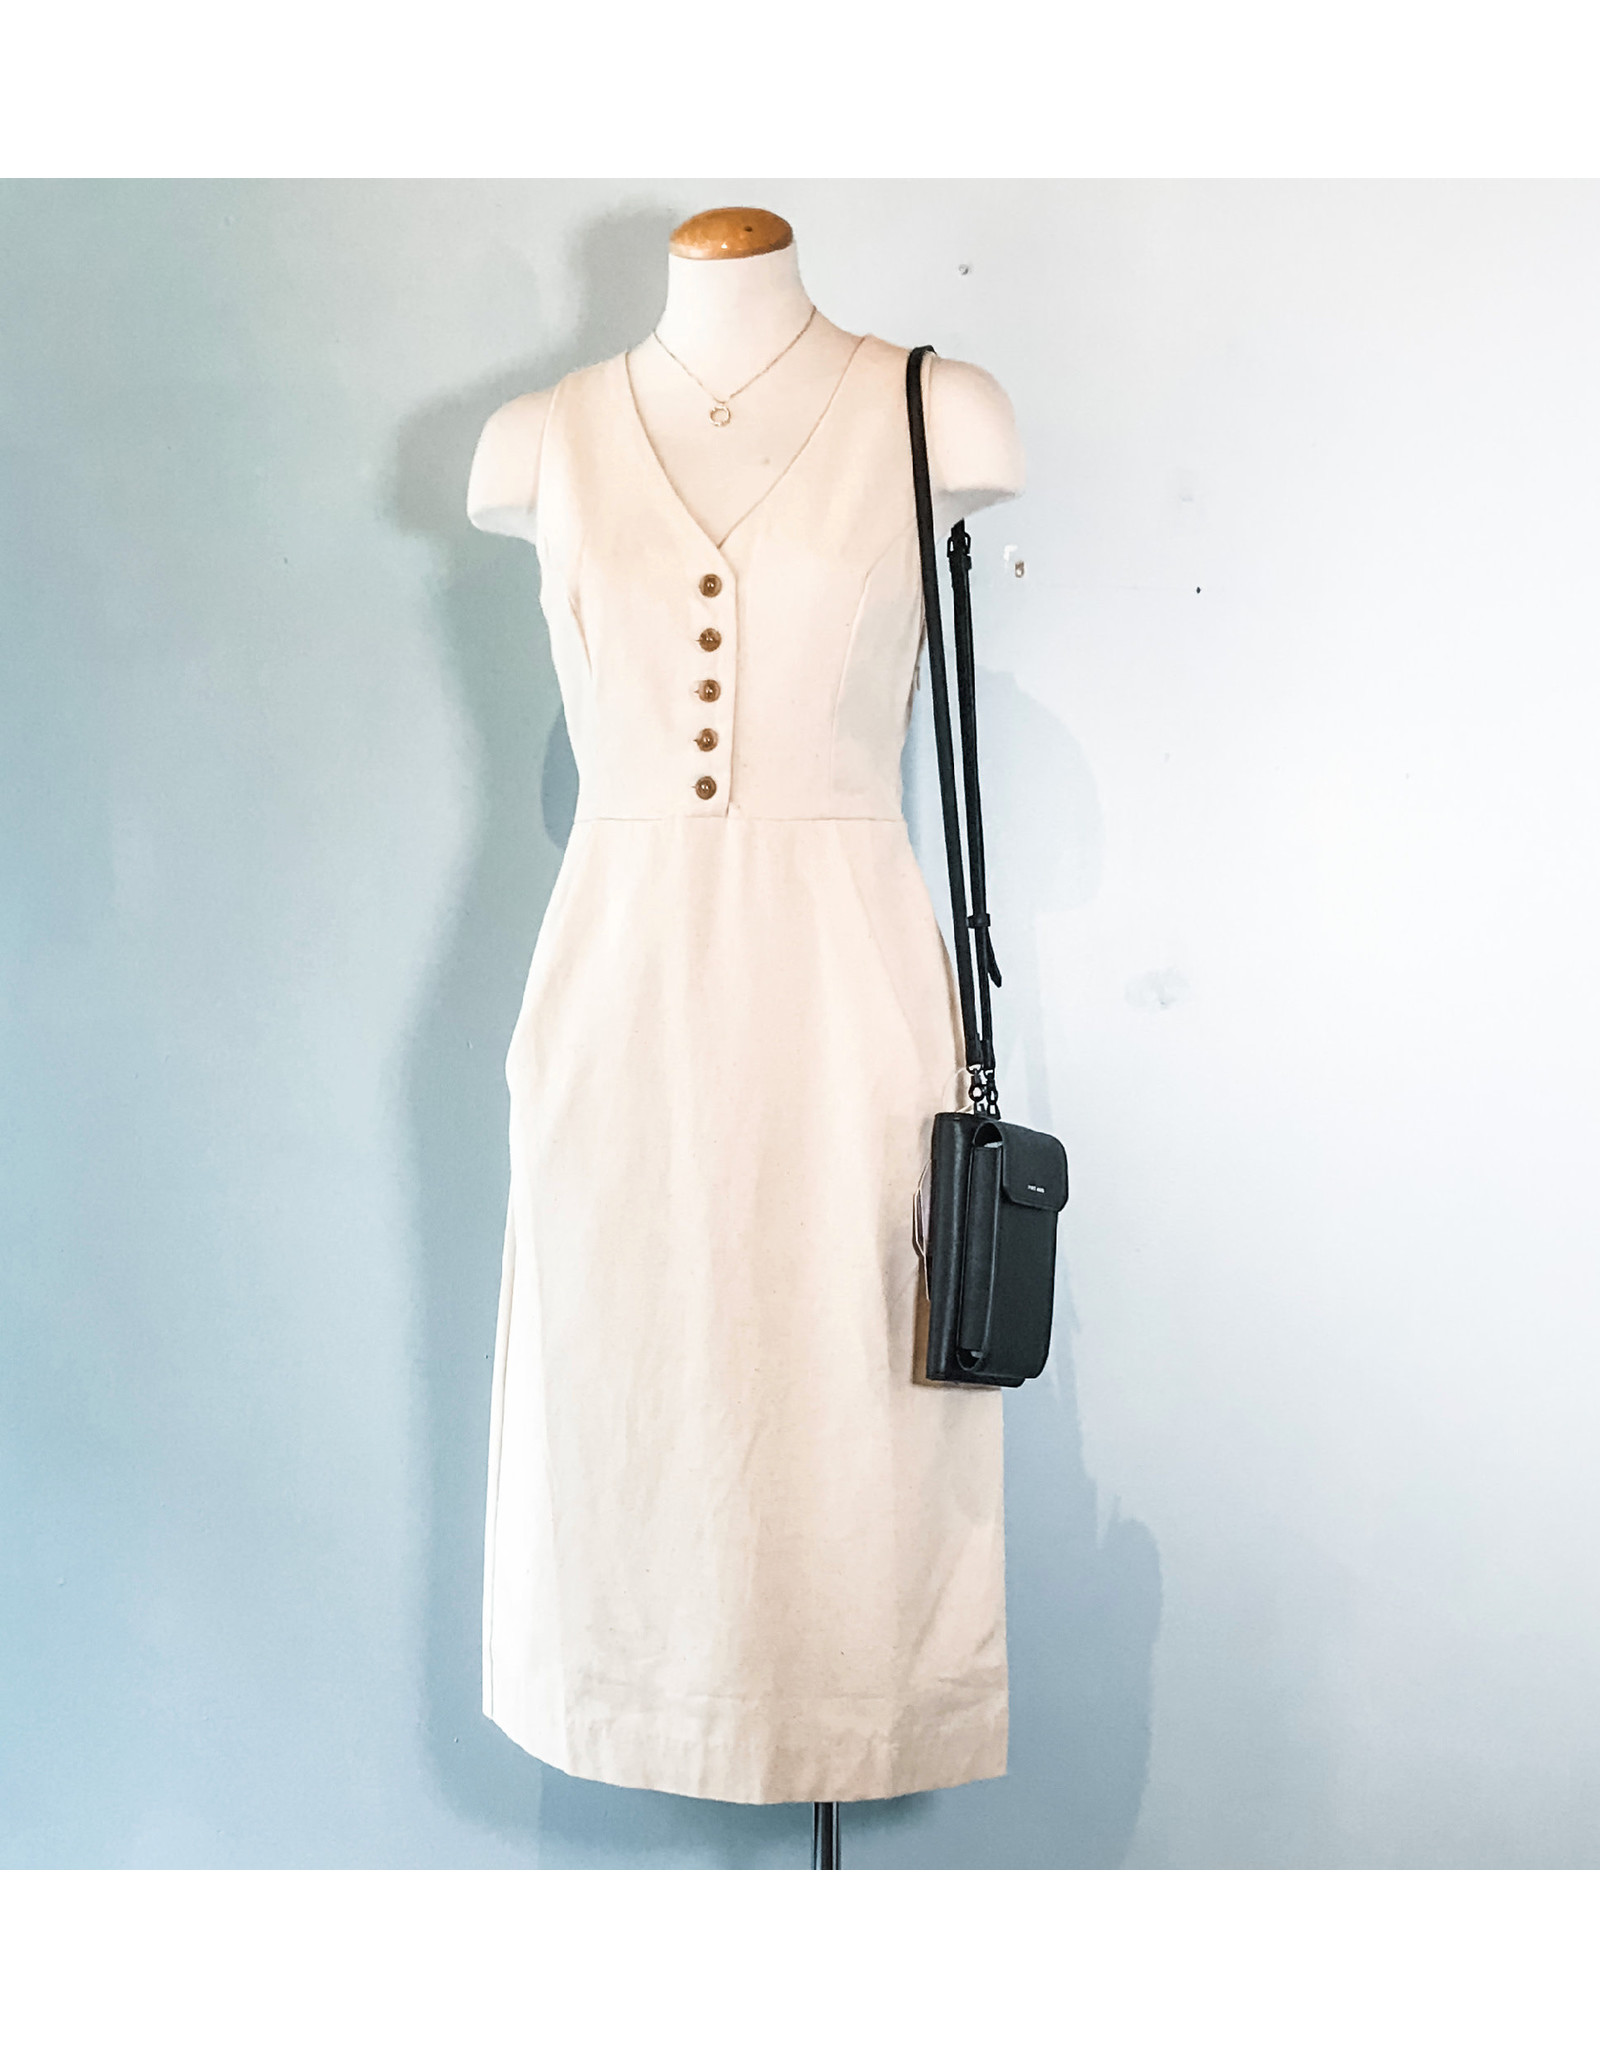 SALE - No Less Than - Sleeveless Pocket Dress